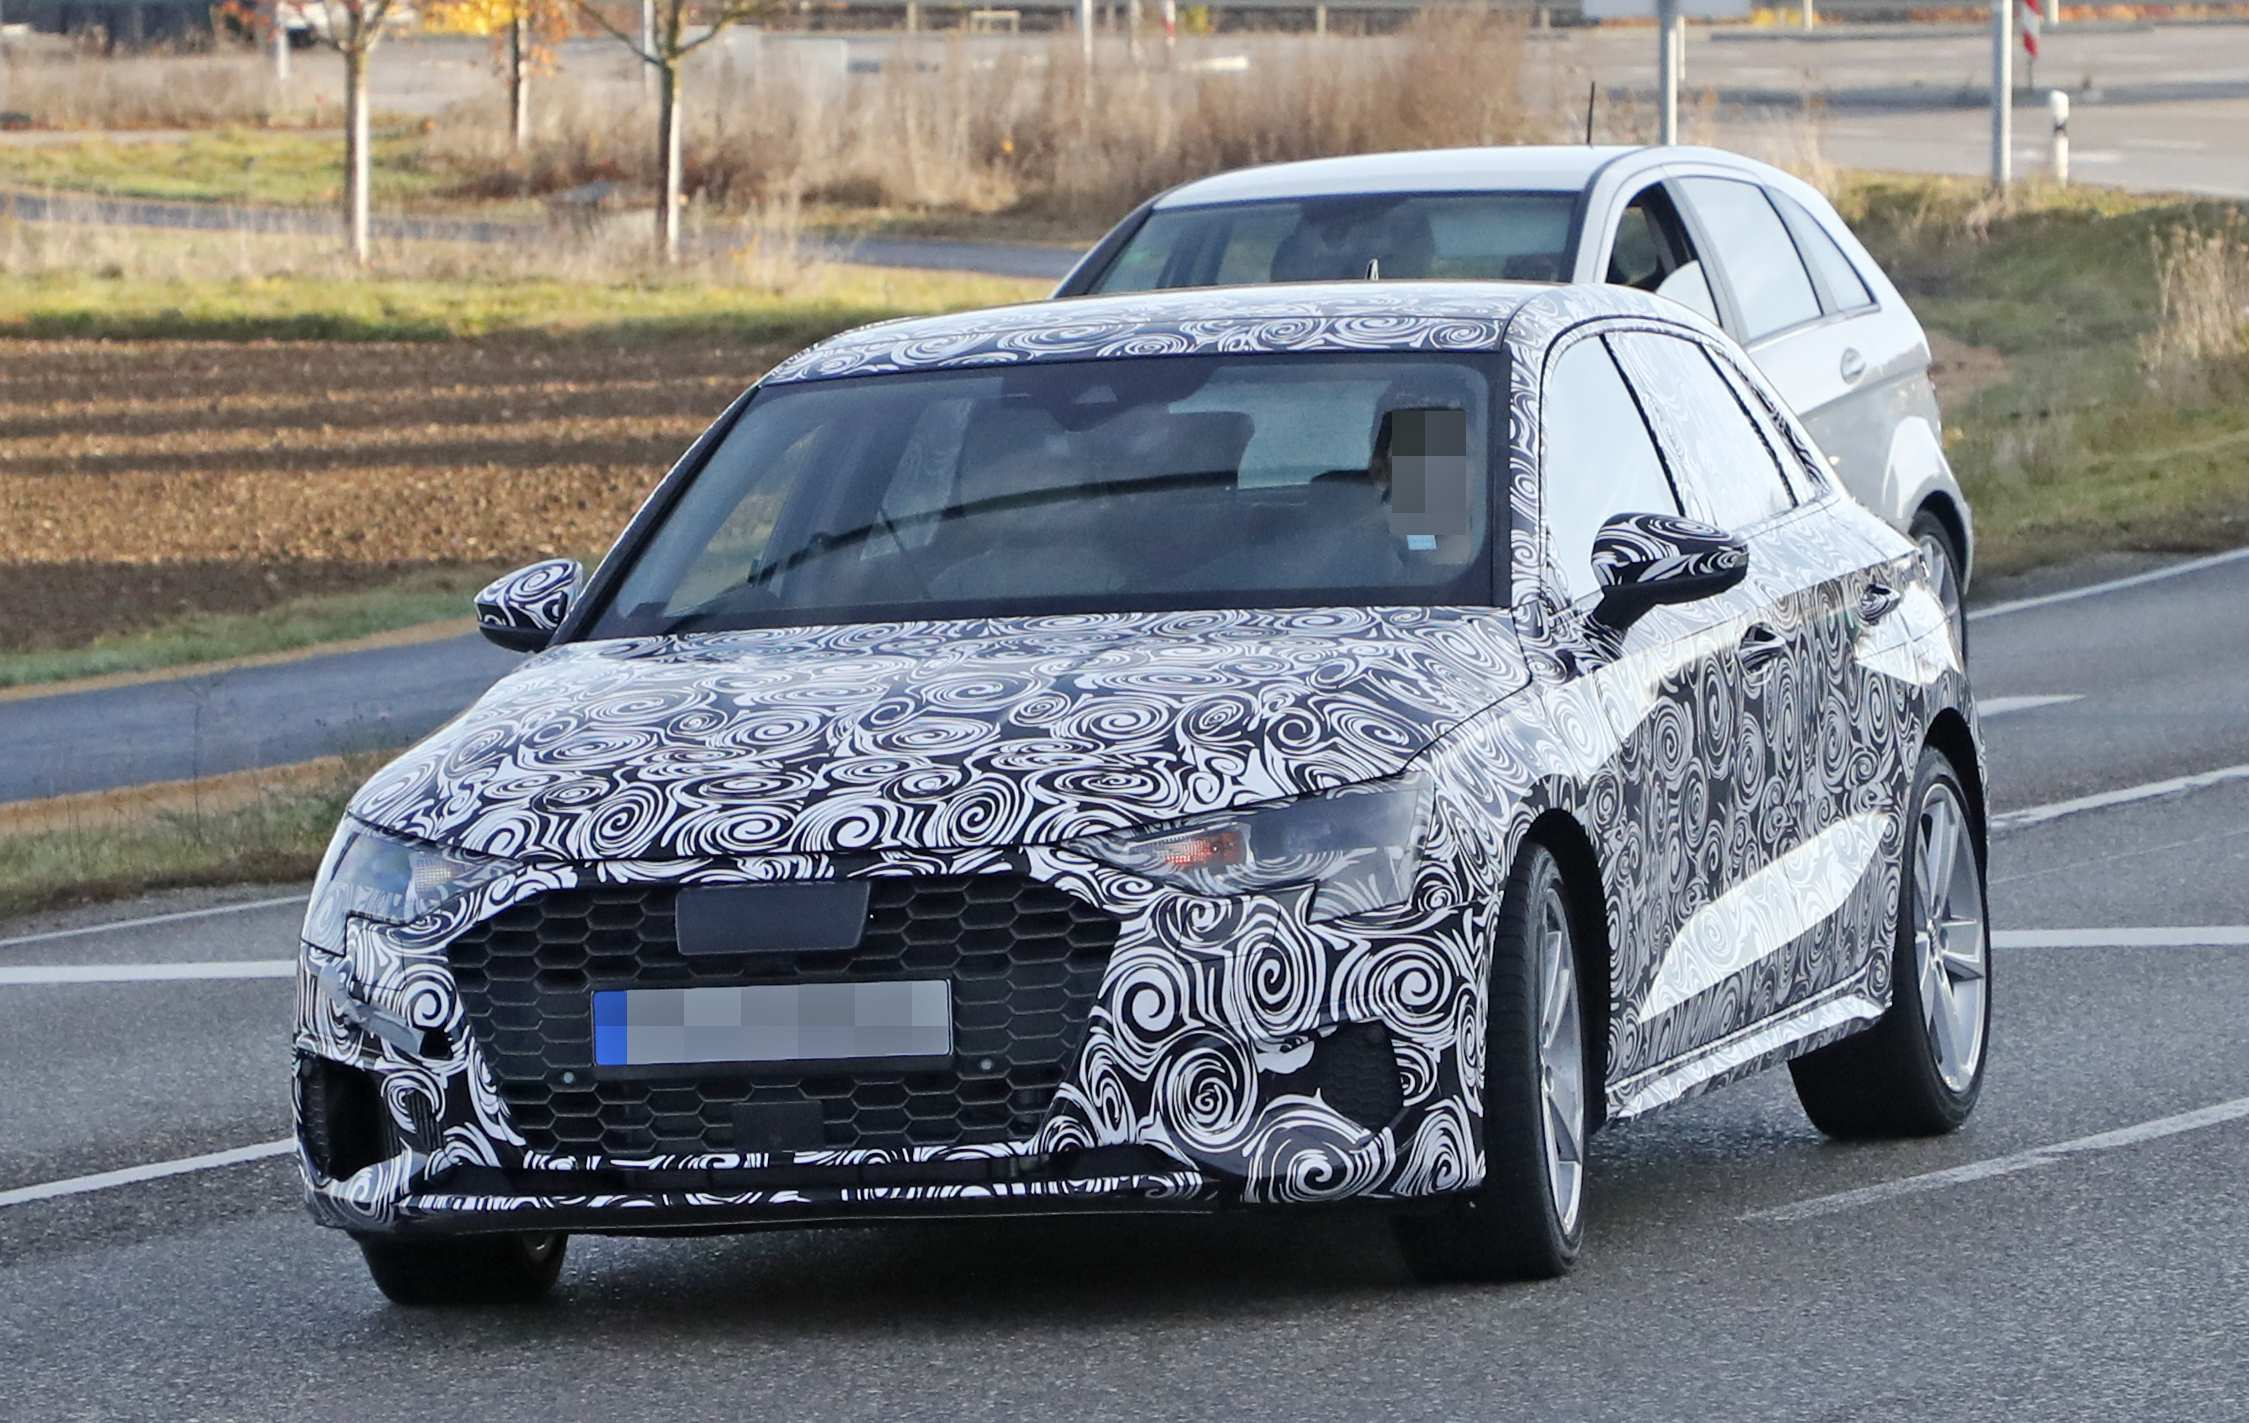 20 Gallery of Audi A3 Hatchback 2020 Price for Audi A3 Hatchback 2020